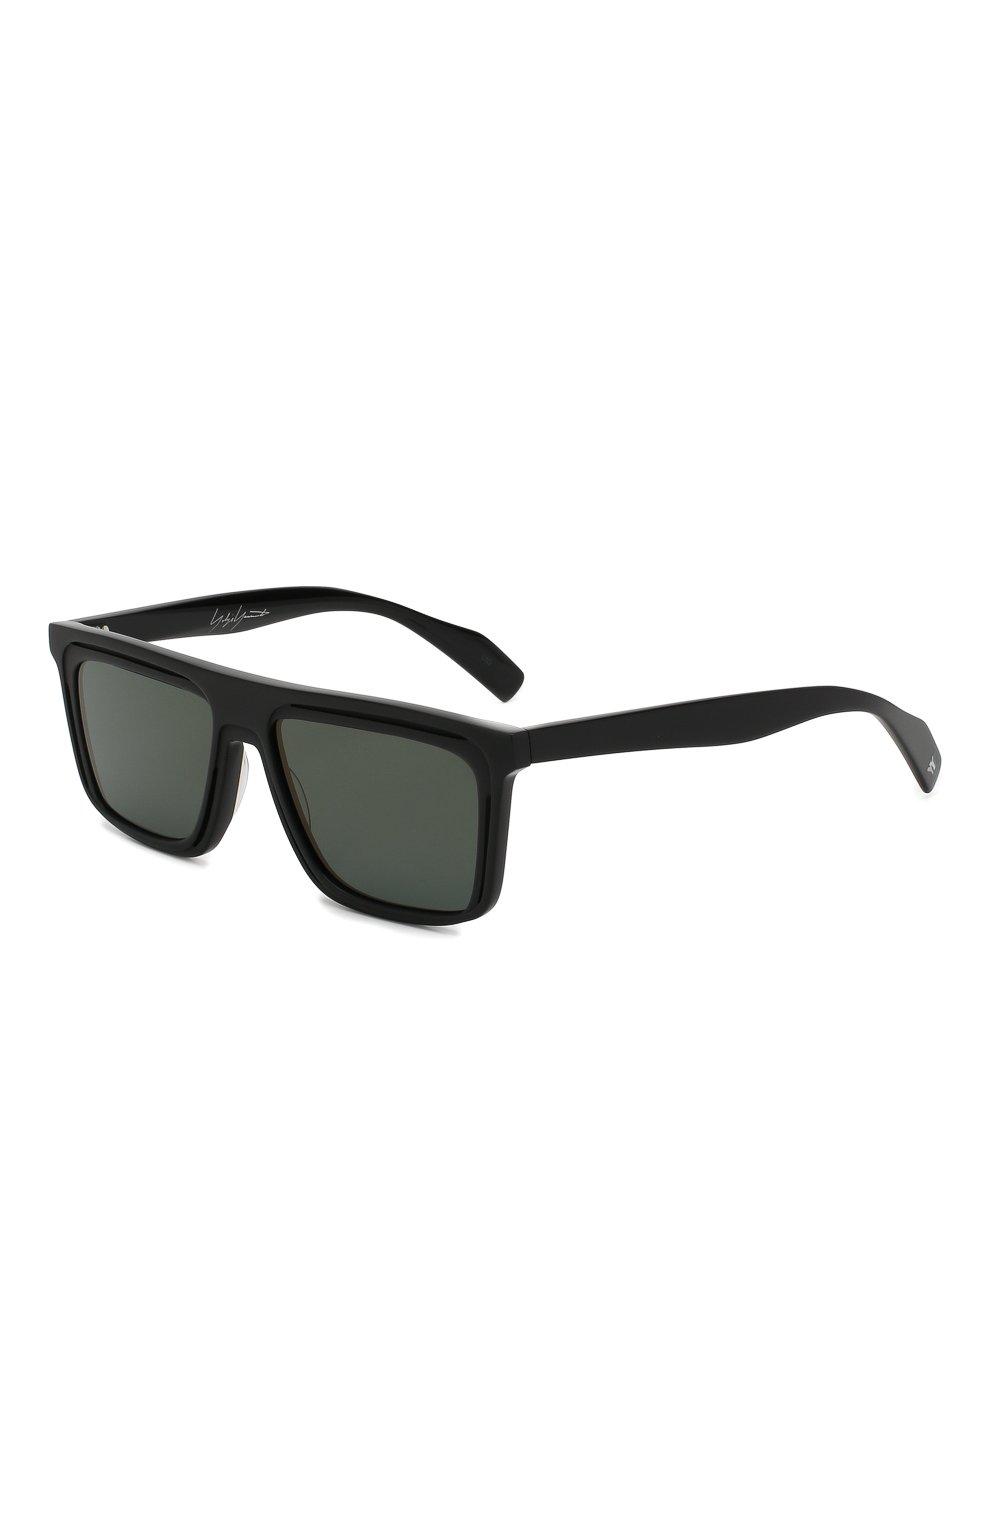 Мужские солнцезащитные очки YOHJI YAMAMOTO черного цвета, арт. YY5020 002 | Фото 1